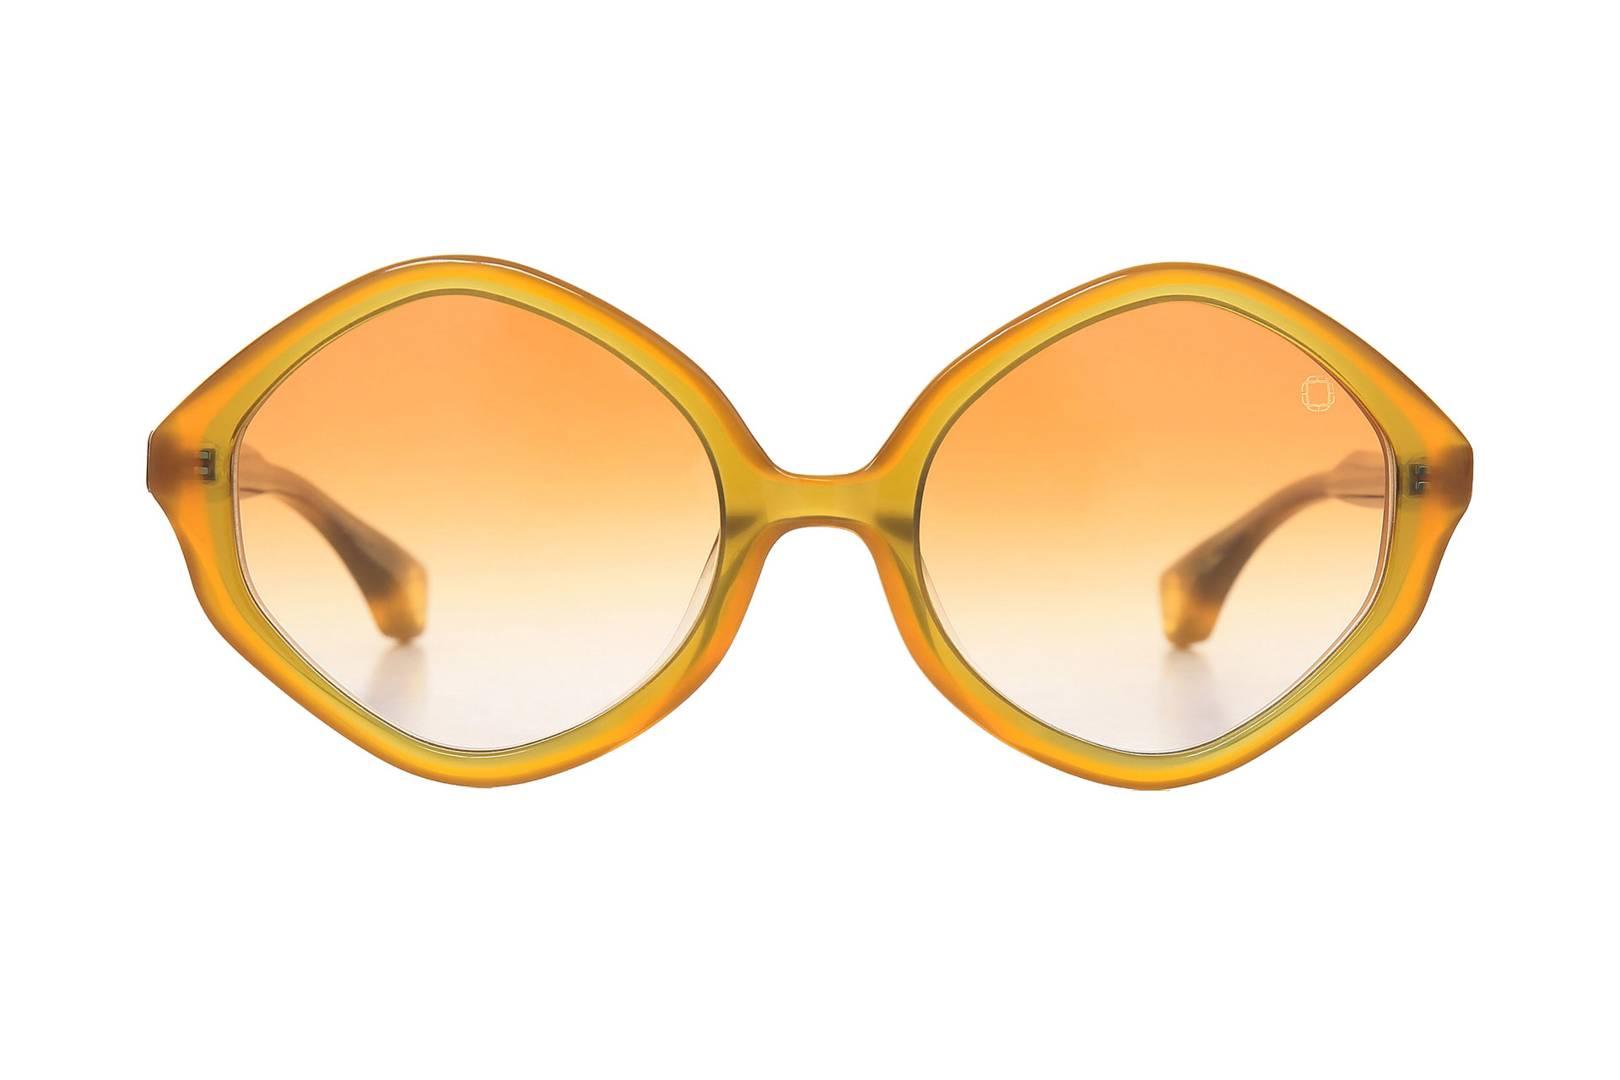 1811673443c4 Selfridges Opens The Largest Eyewear Department In The UK